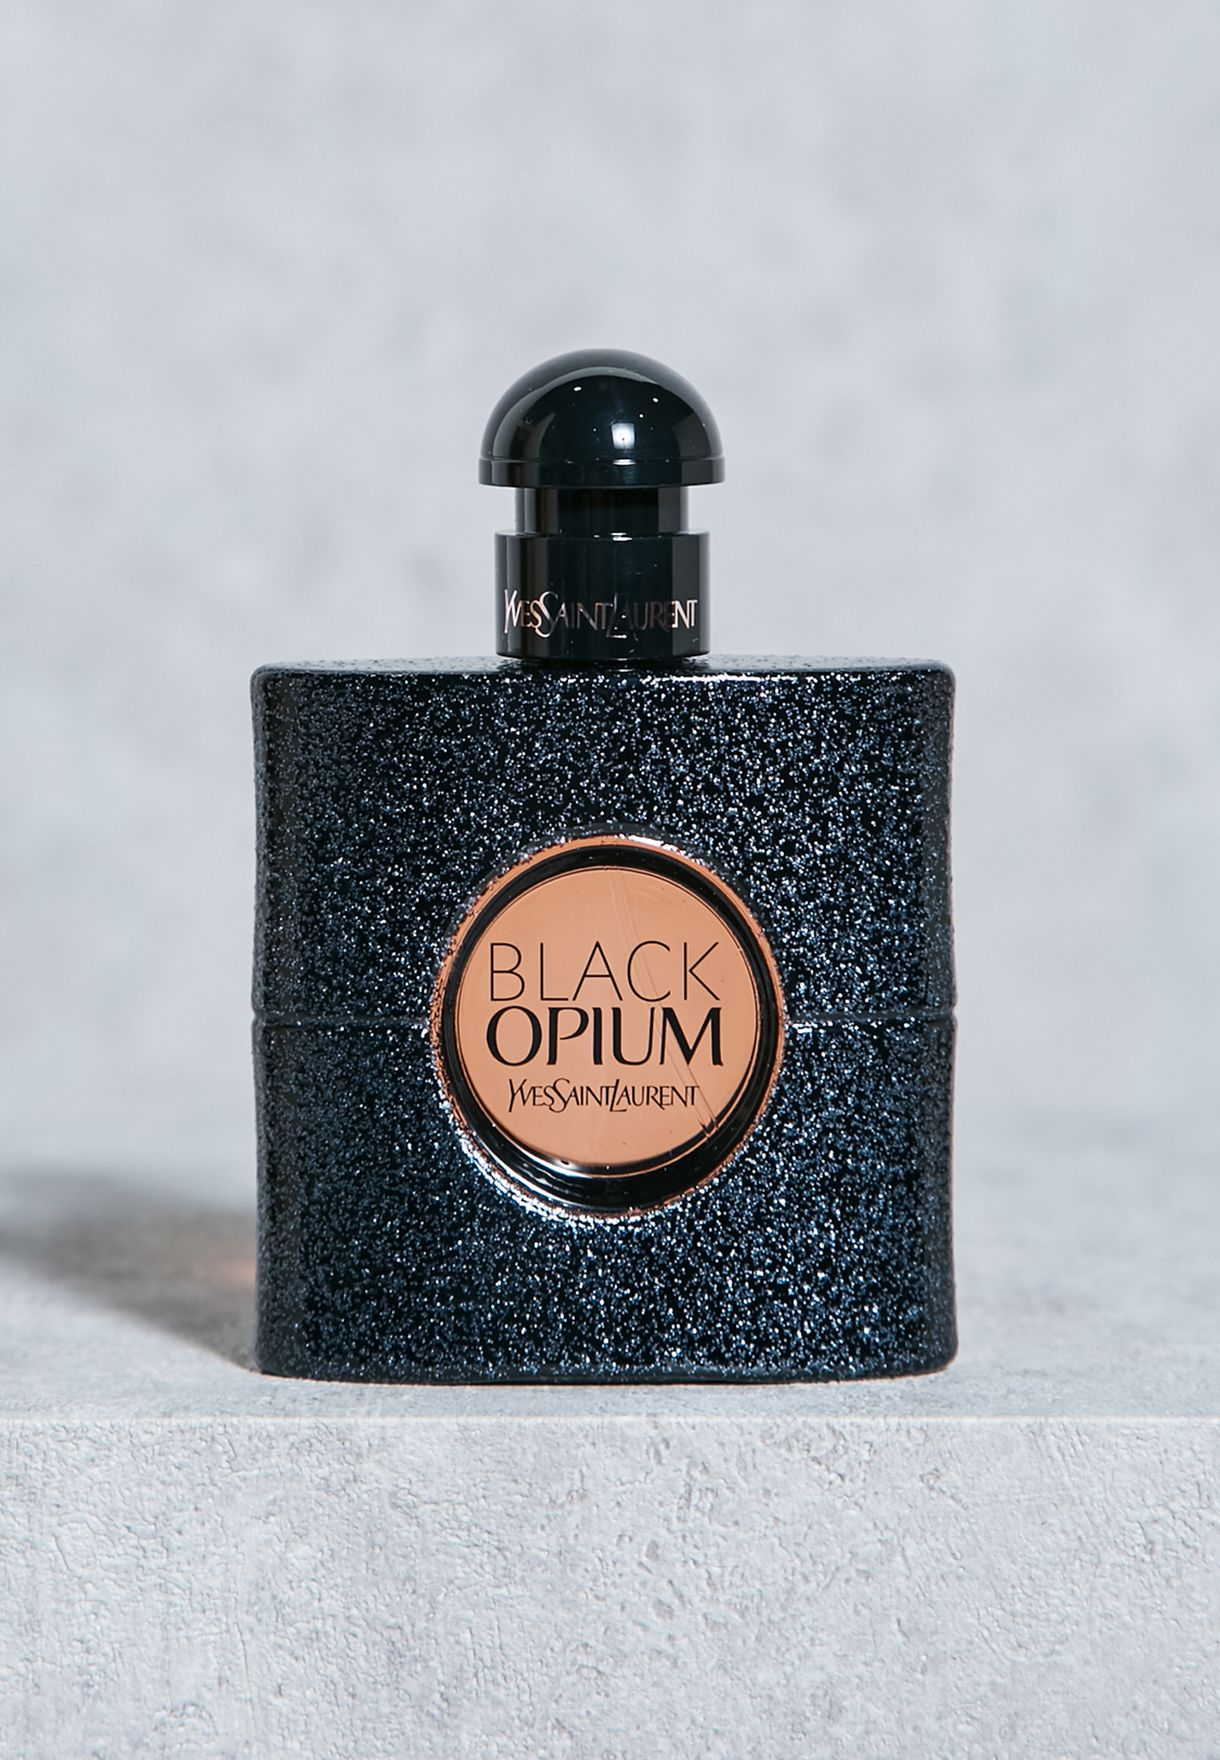 959cf155a تسوق بلاك اوبيوم-50 مل ماركة ايف سان لوران لون أسود 3365440787919 في ...